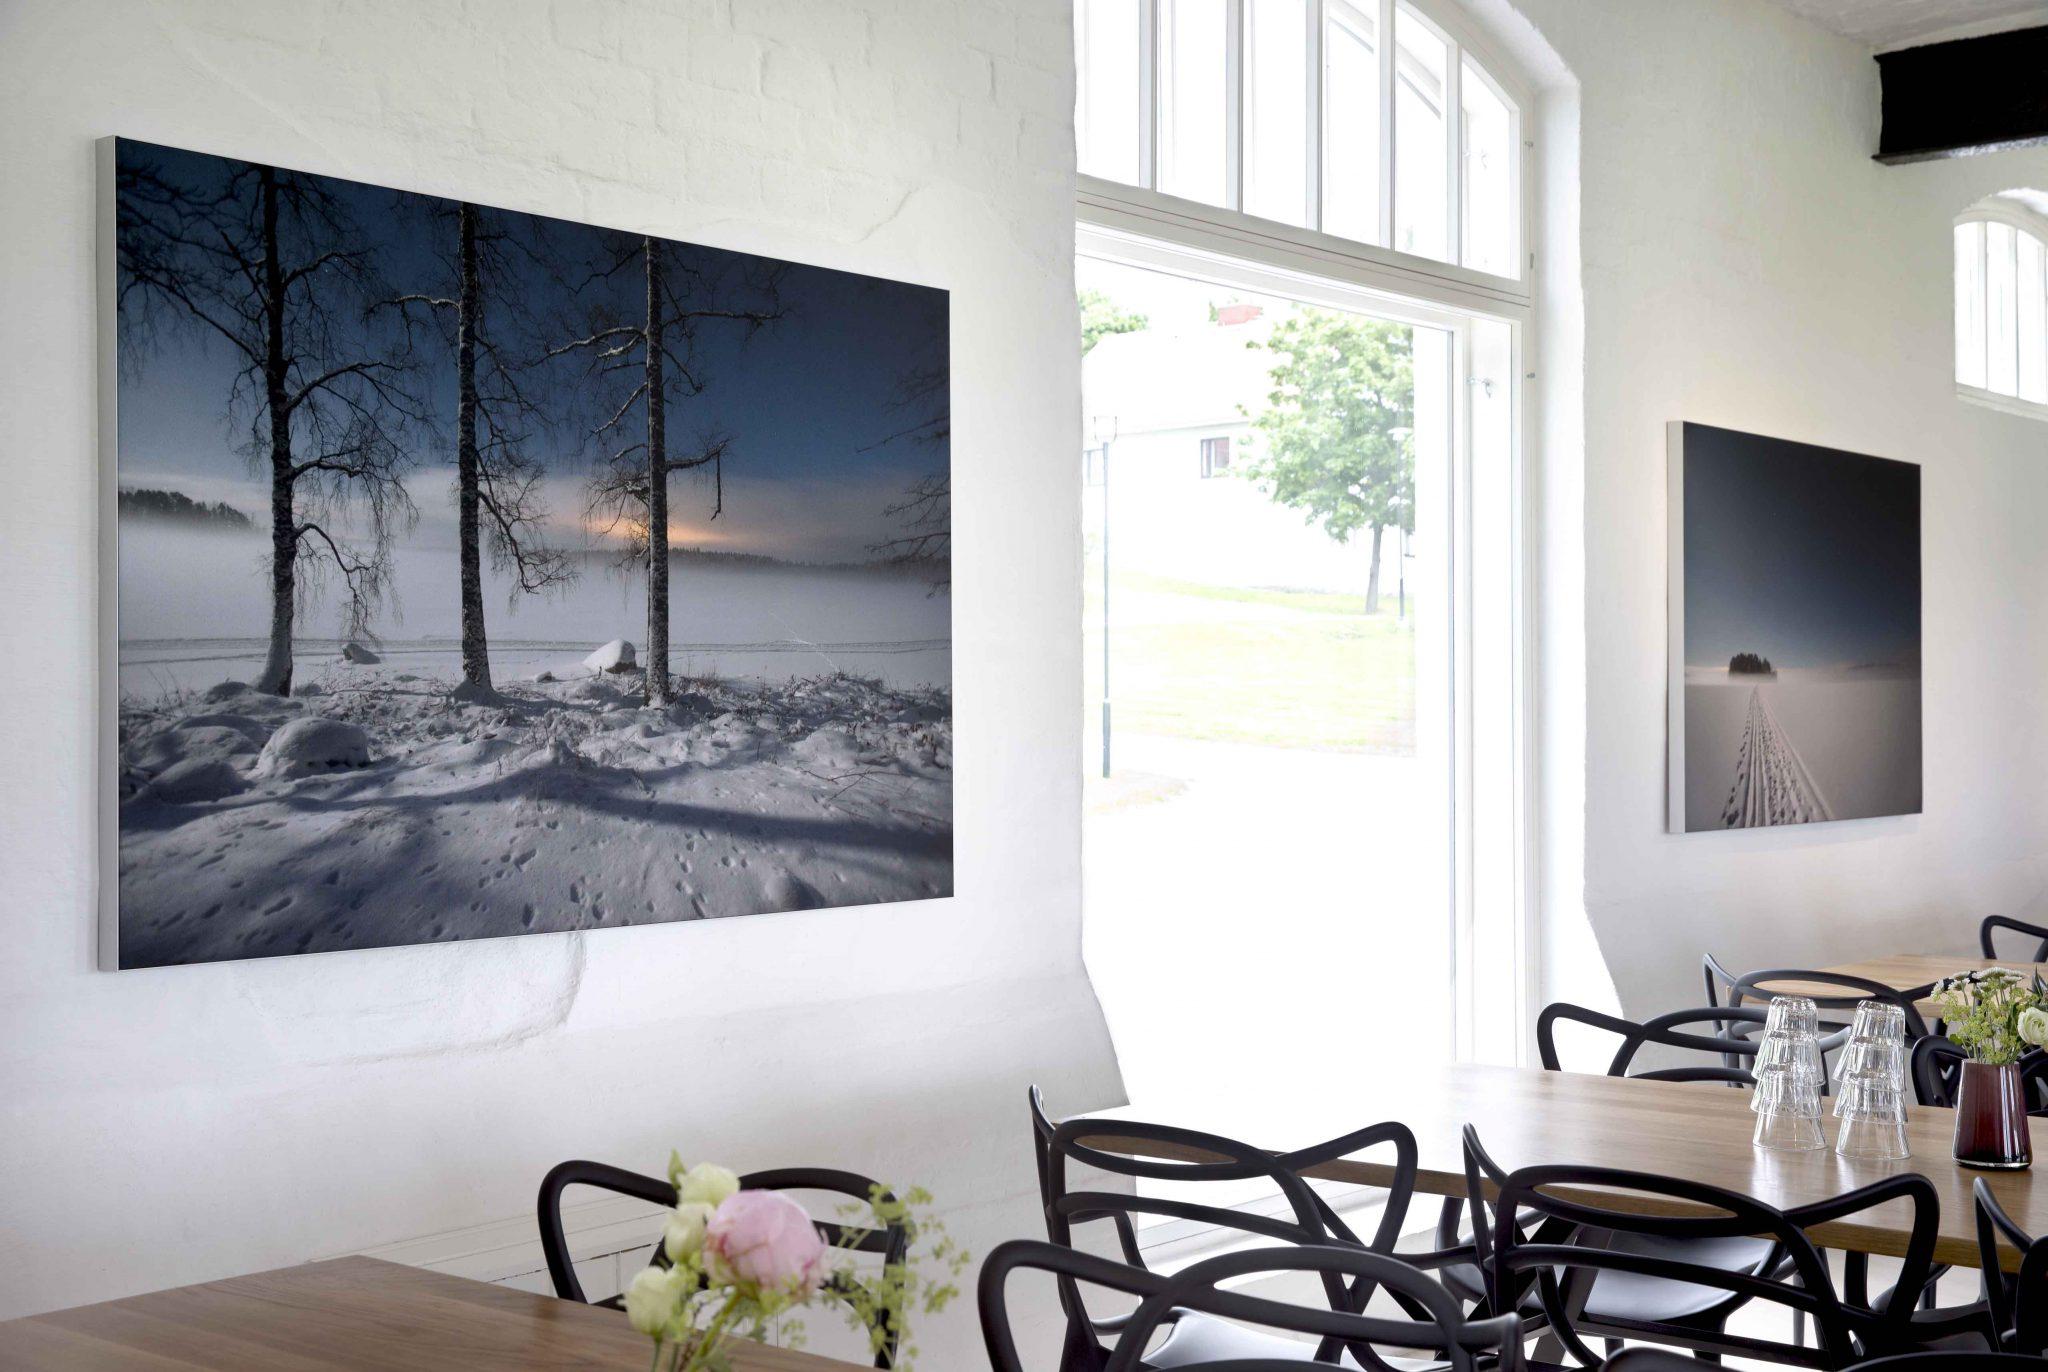 Laukon kartano, Laukko herrgård - Fotograf Erja Lempinen